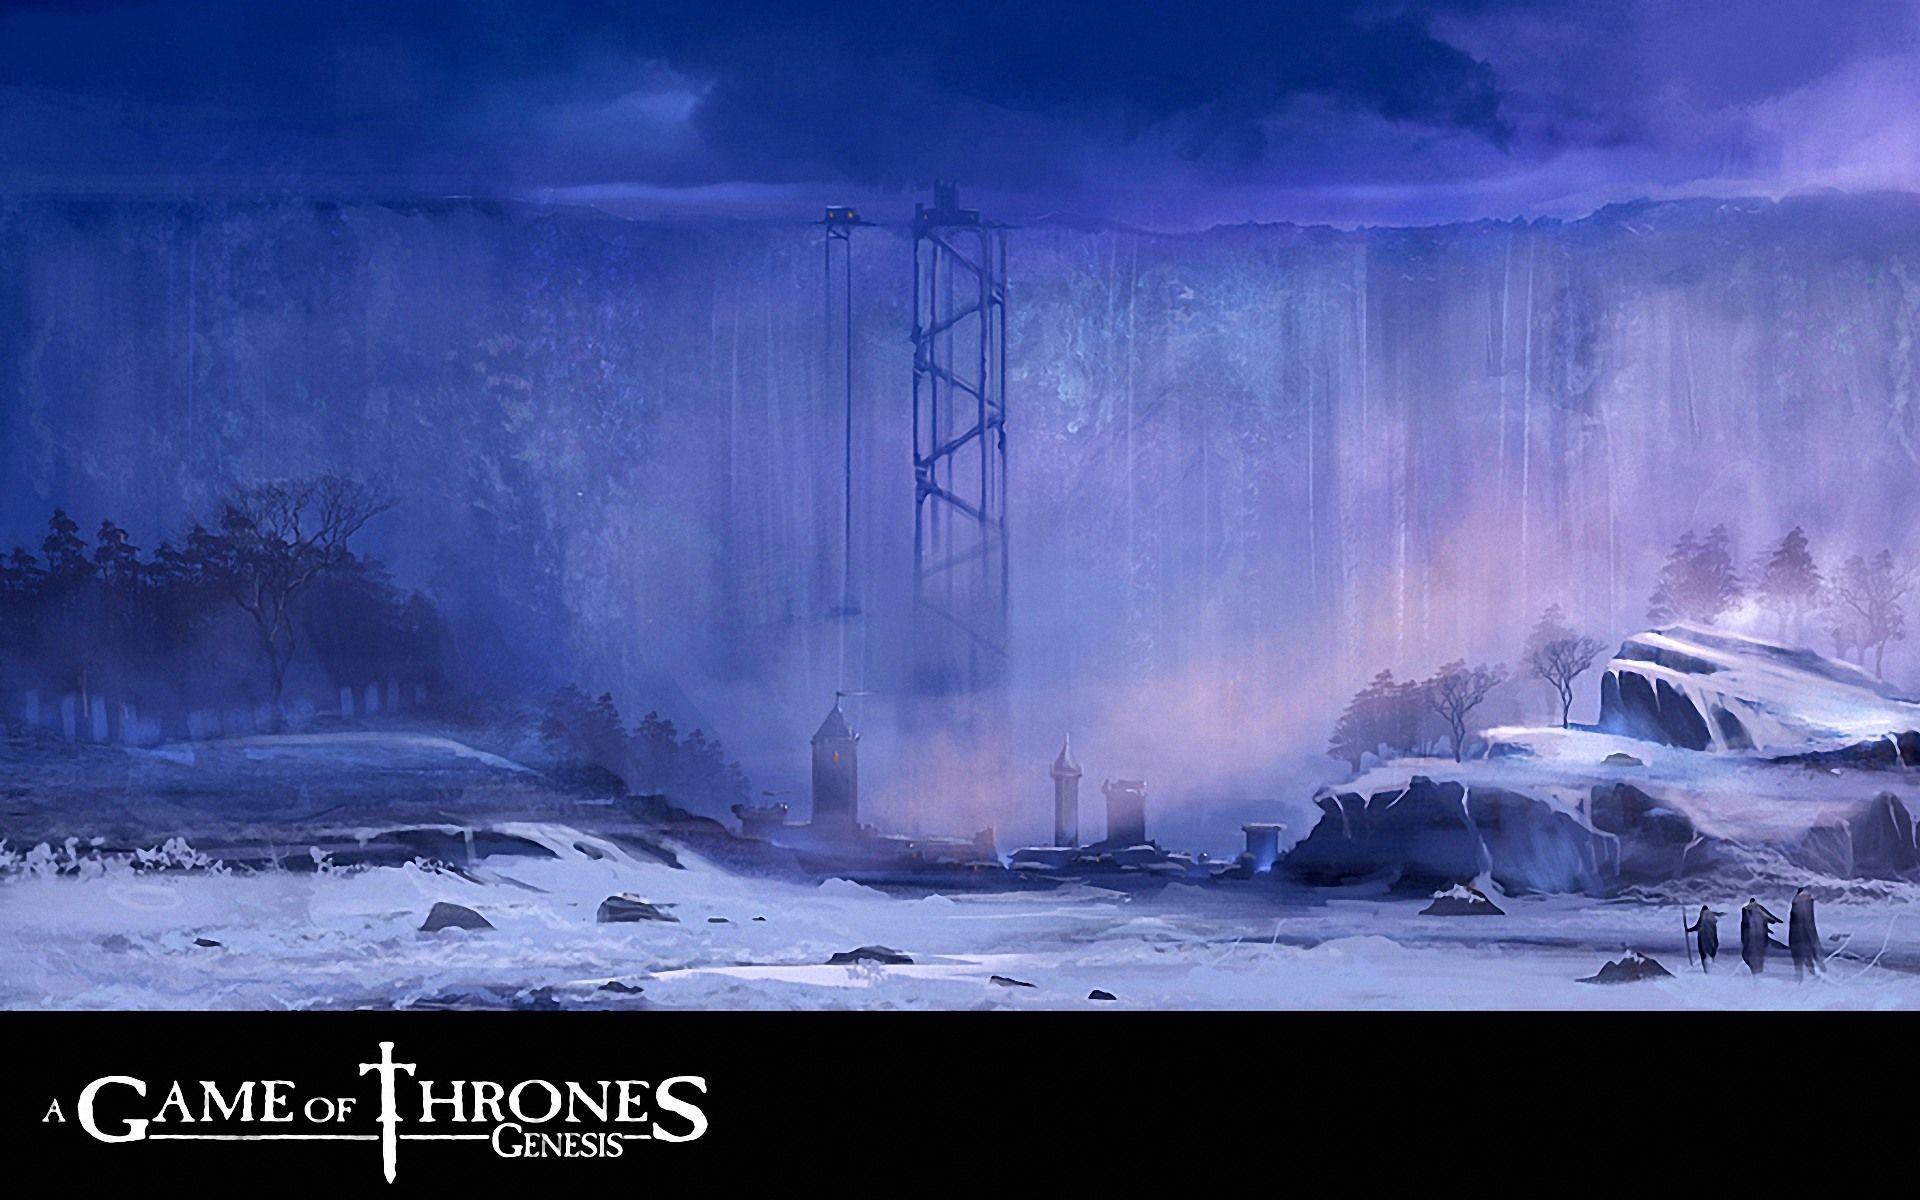 Game Of Thrones Art Got Tv Shows 1920x1200 Wallpaper399062